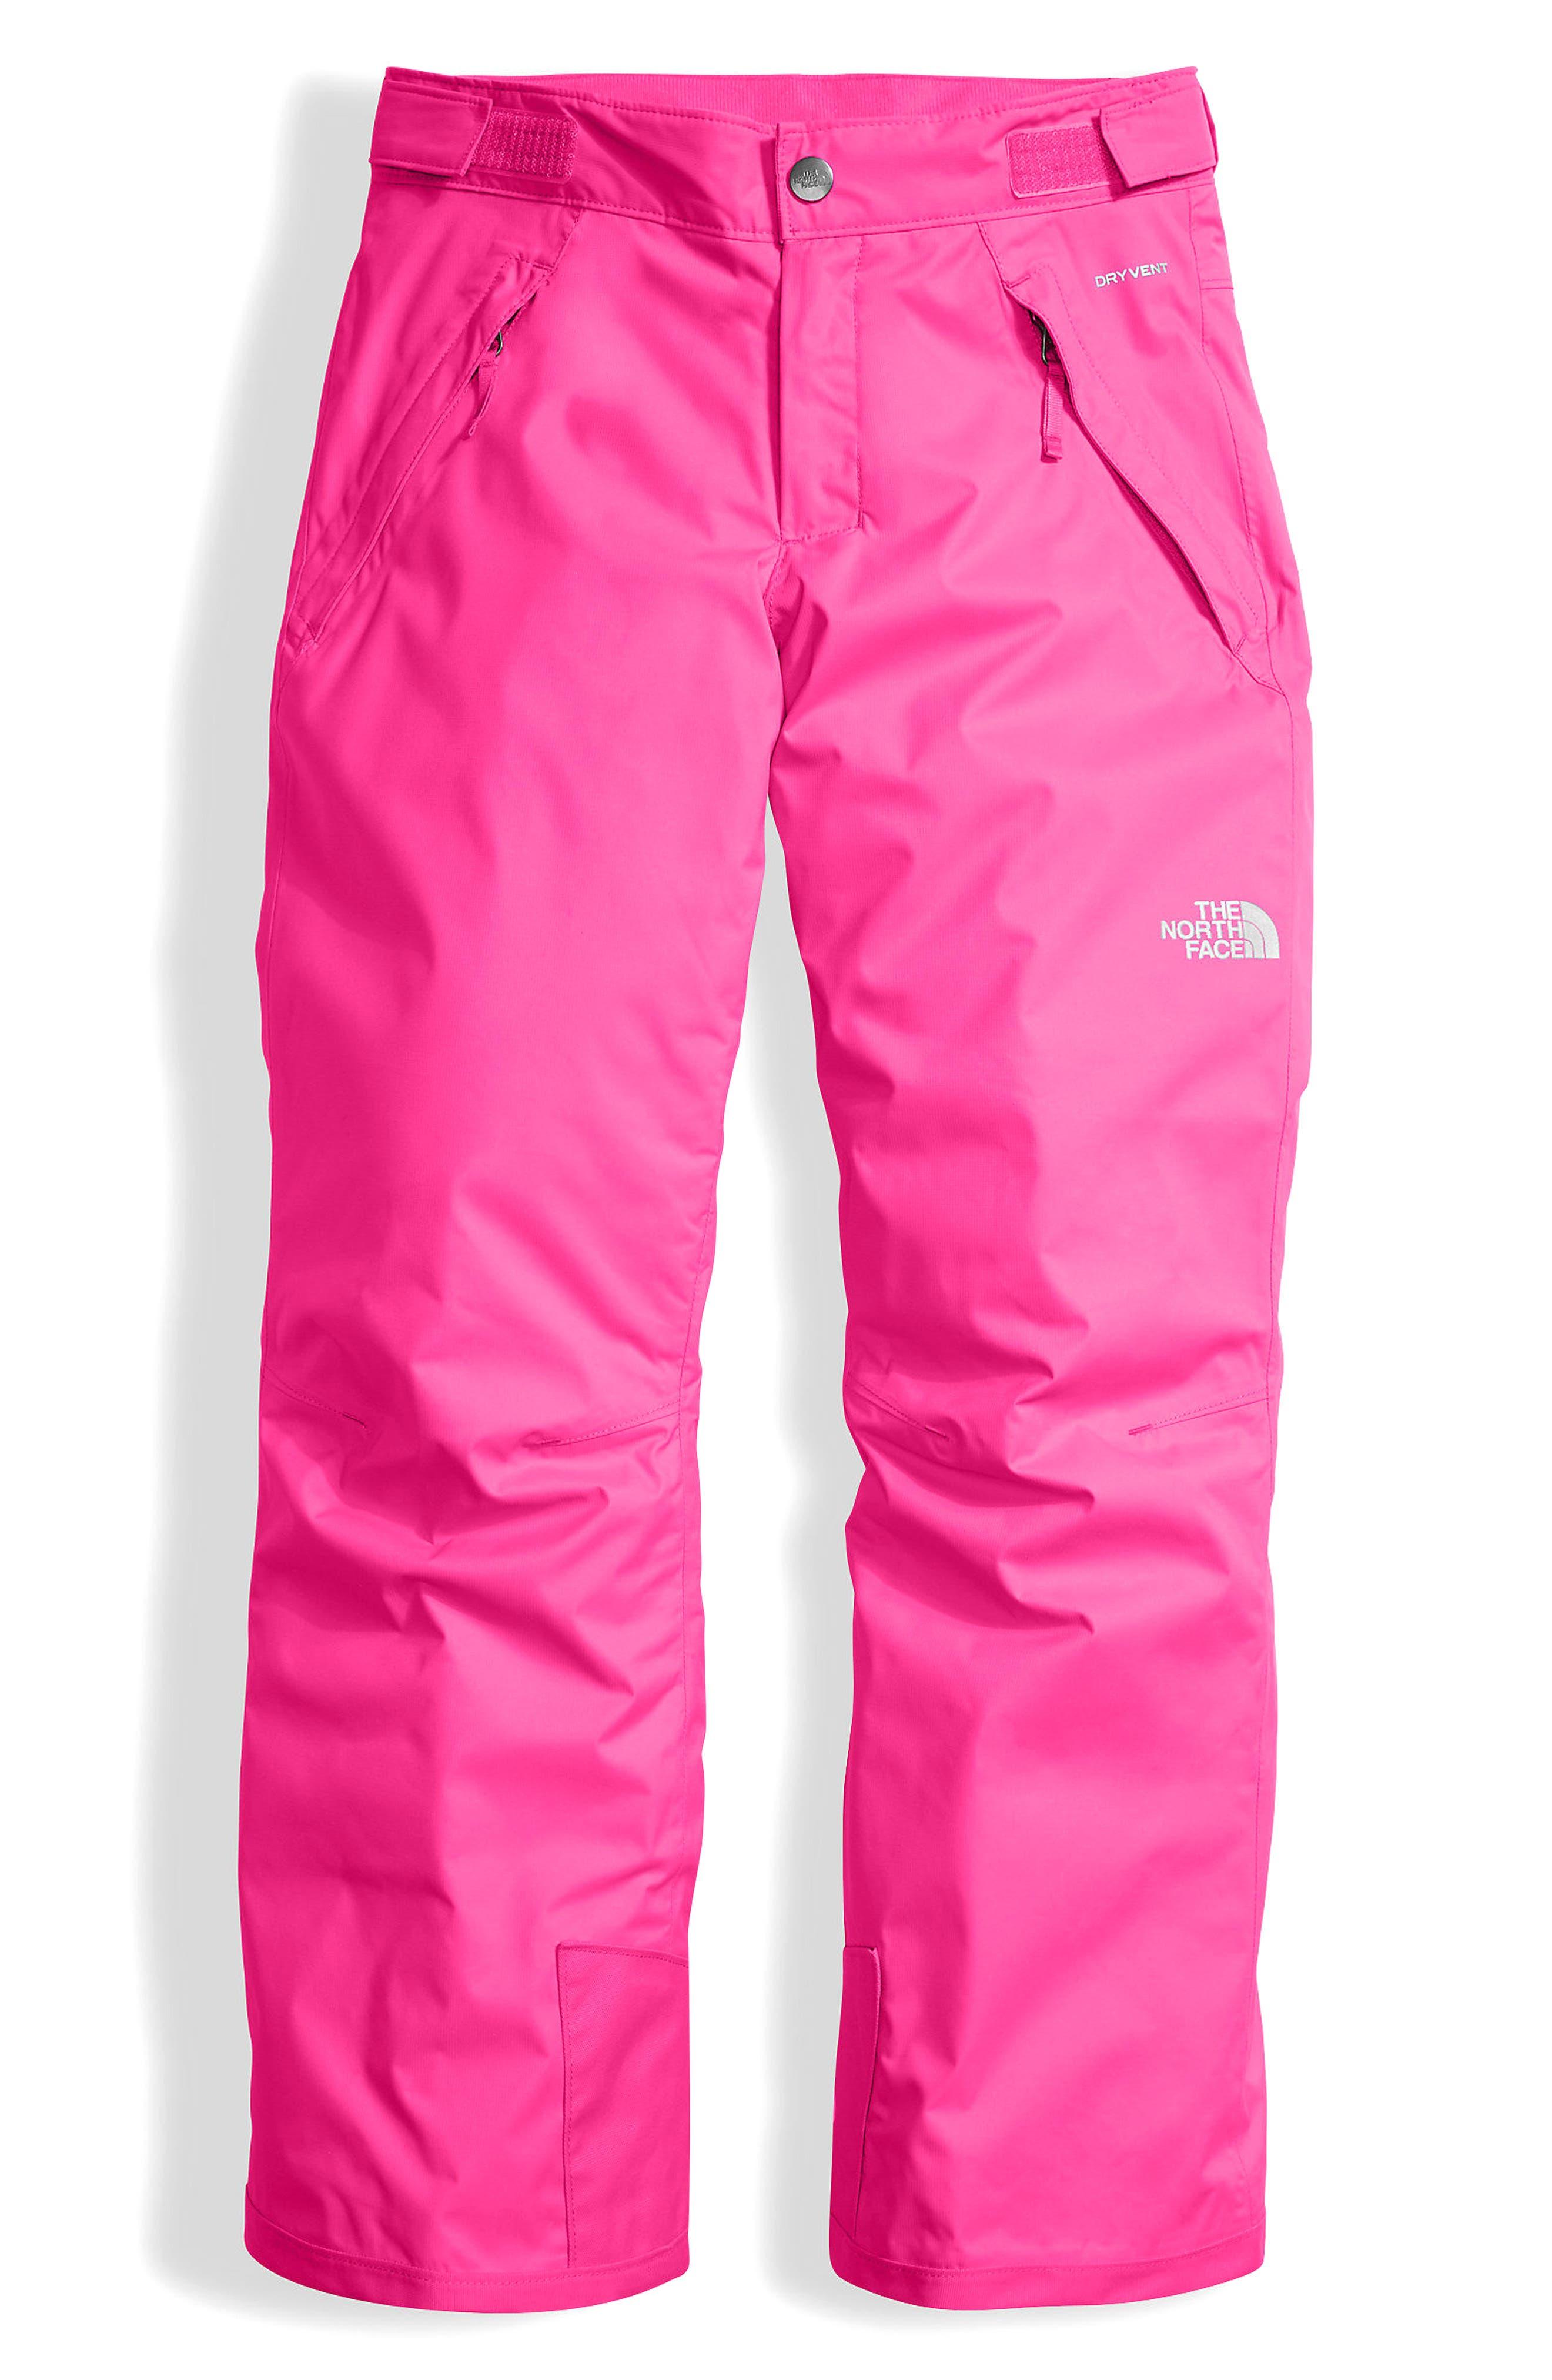 Freedom Waterproof Heatseeker<sup>™</sup> Insulated Snow Pants,                         Main,                         color, Petticoat Pink